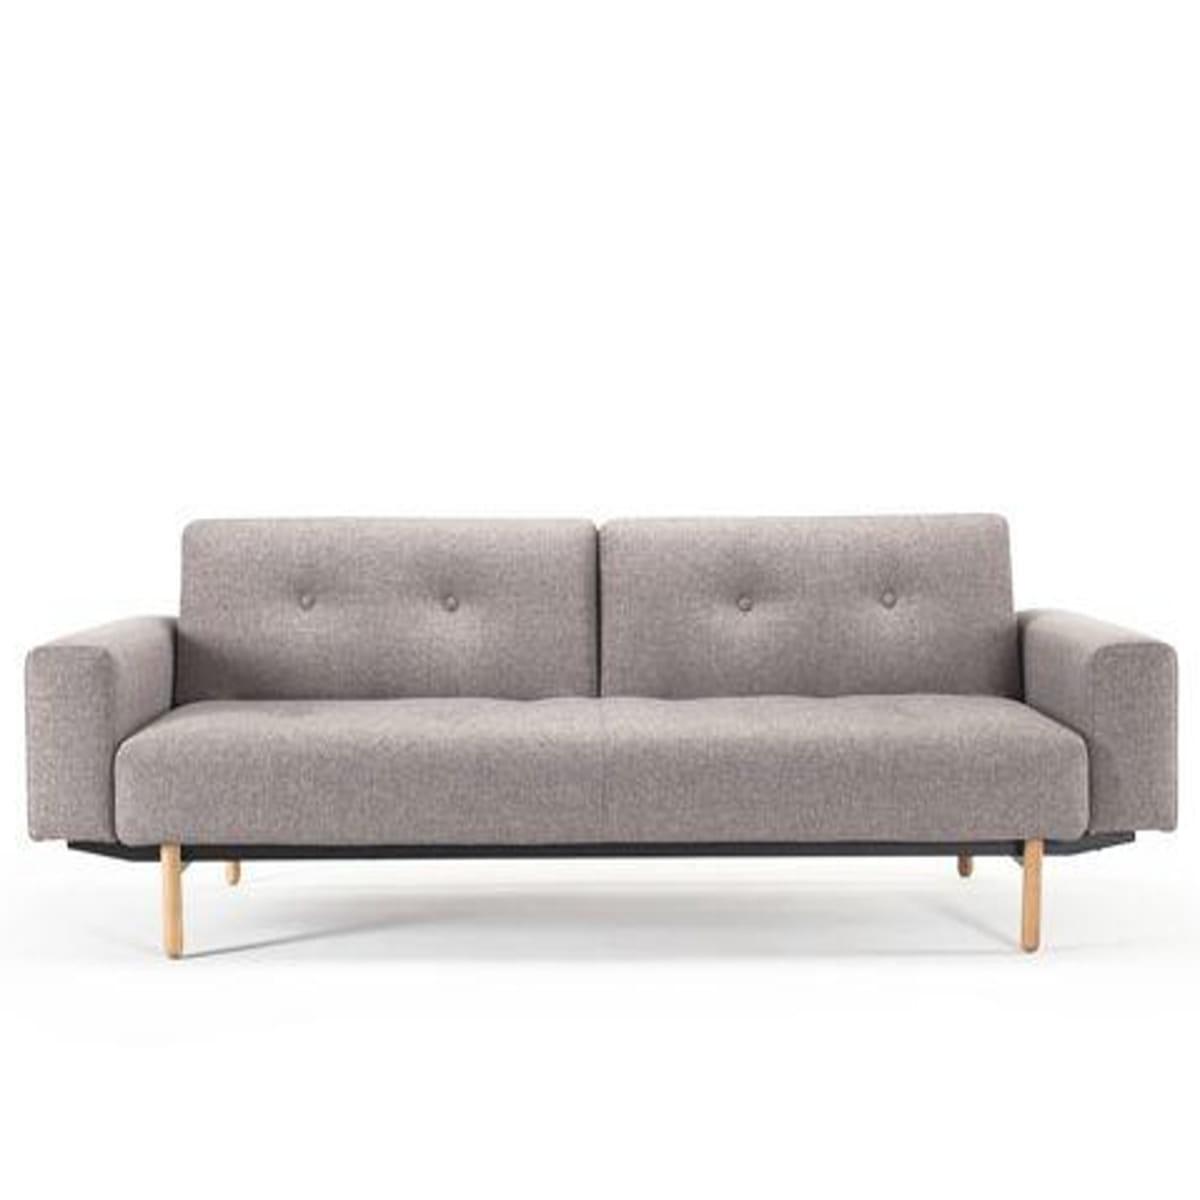 Sofa Ample Stem W Arms Innovation